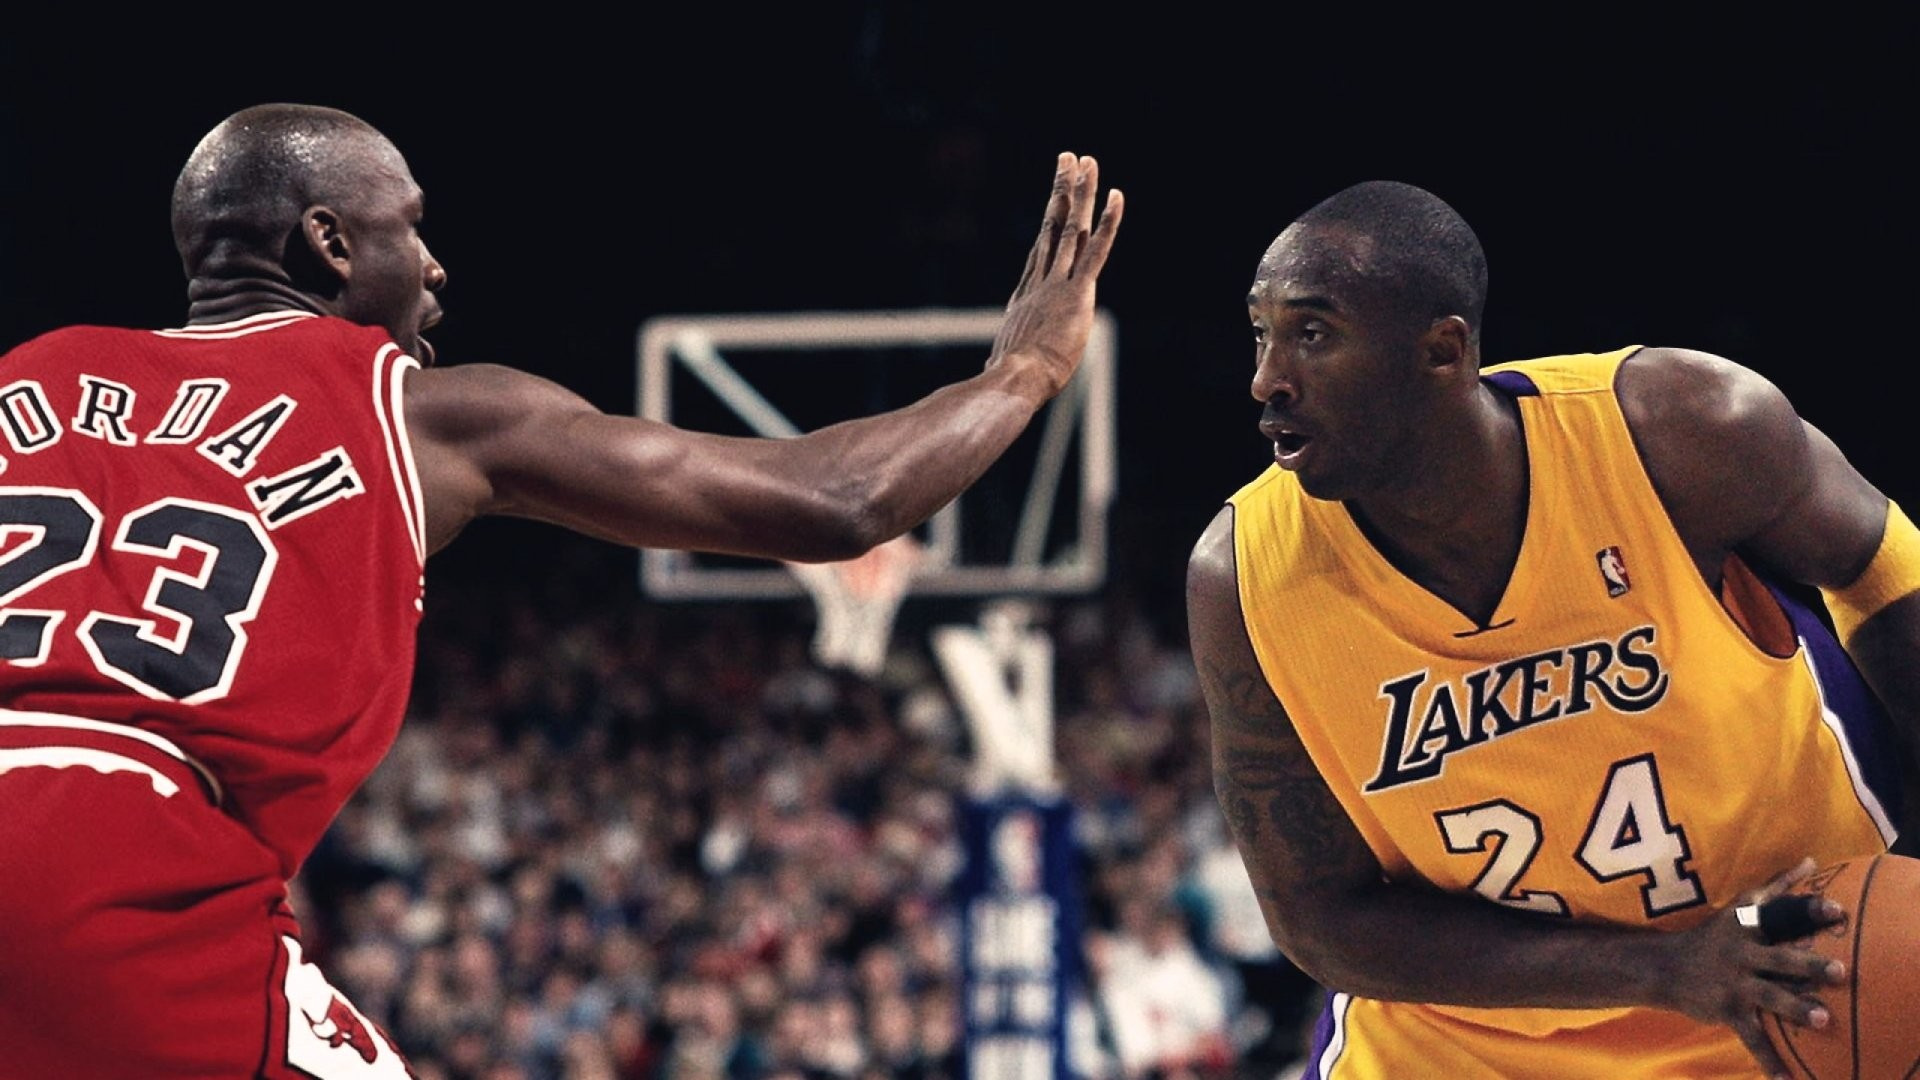 1920x1080 Sports Nba Basketball Michael Jordan Chicago Bulls Player Wallpaper